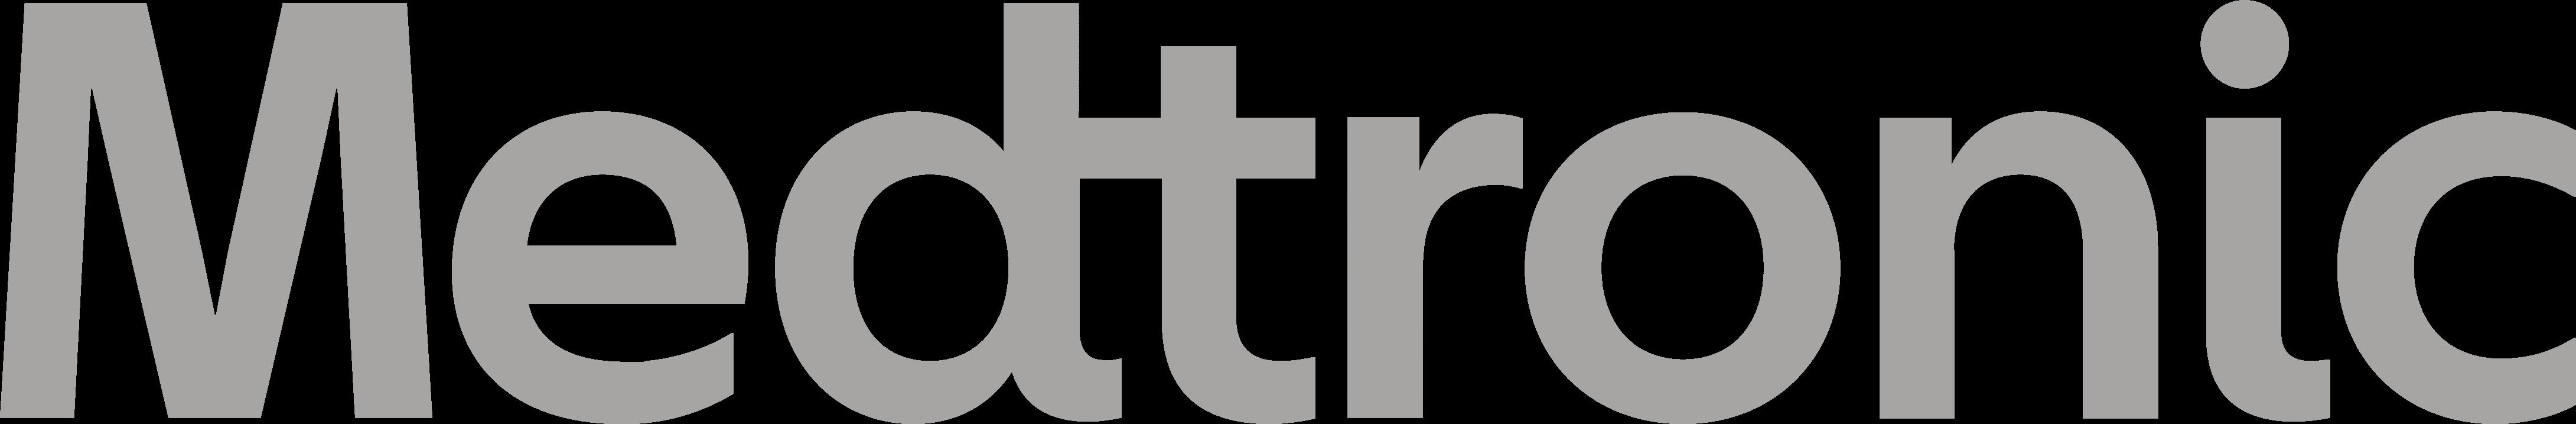 grey-Medtronic_logo.png